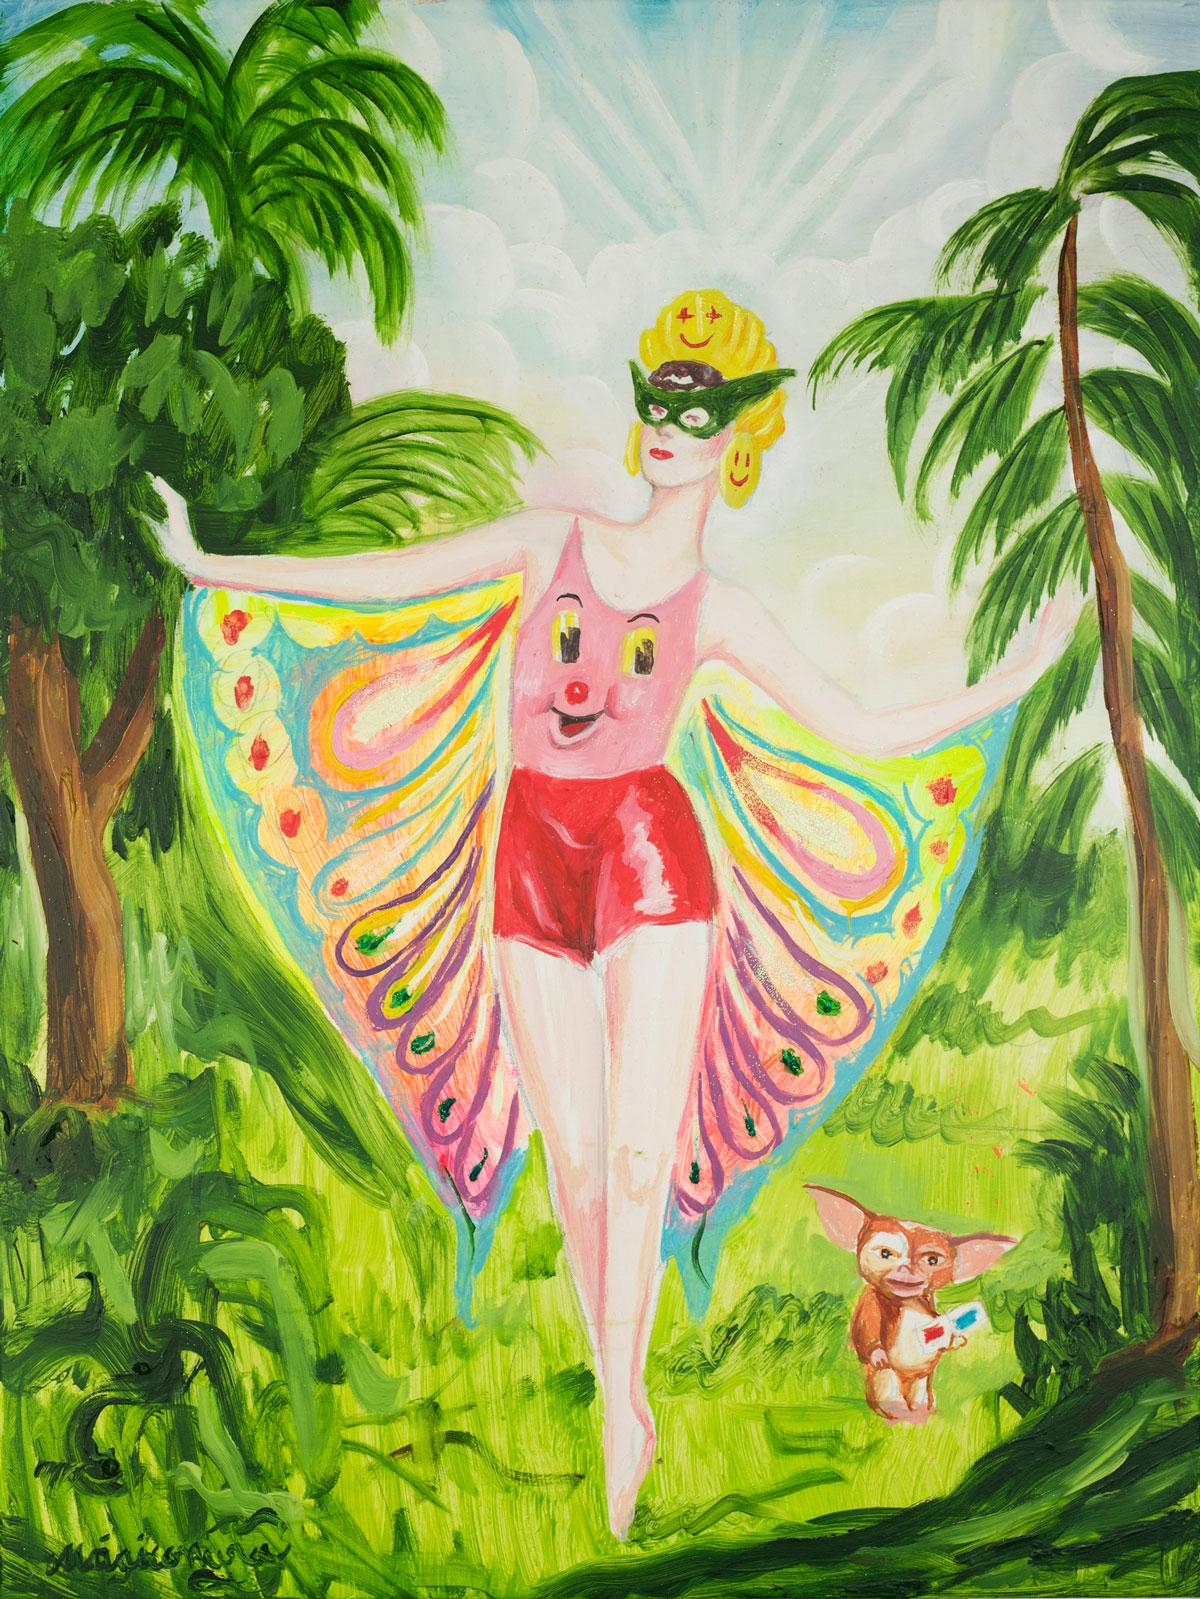 Sergio Mora, Butterfly dancer, 2020, oil on canvas, 61,5x46 cm